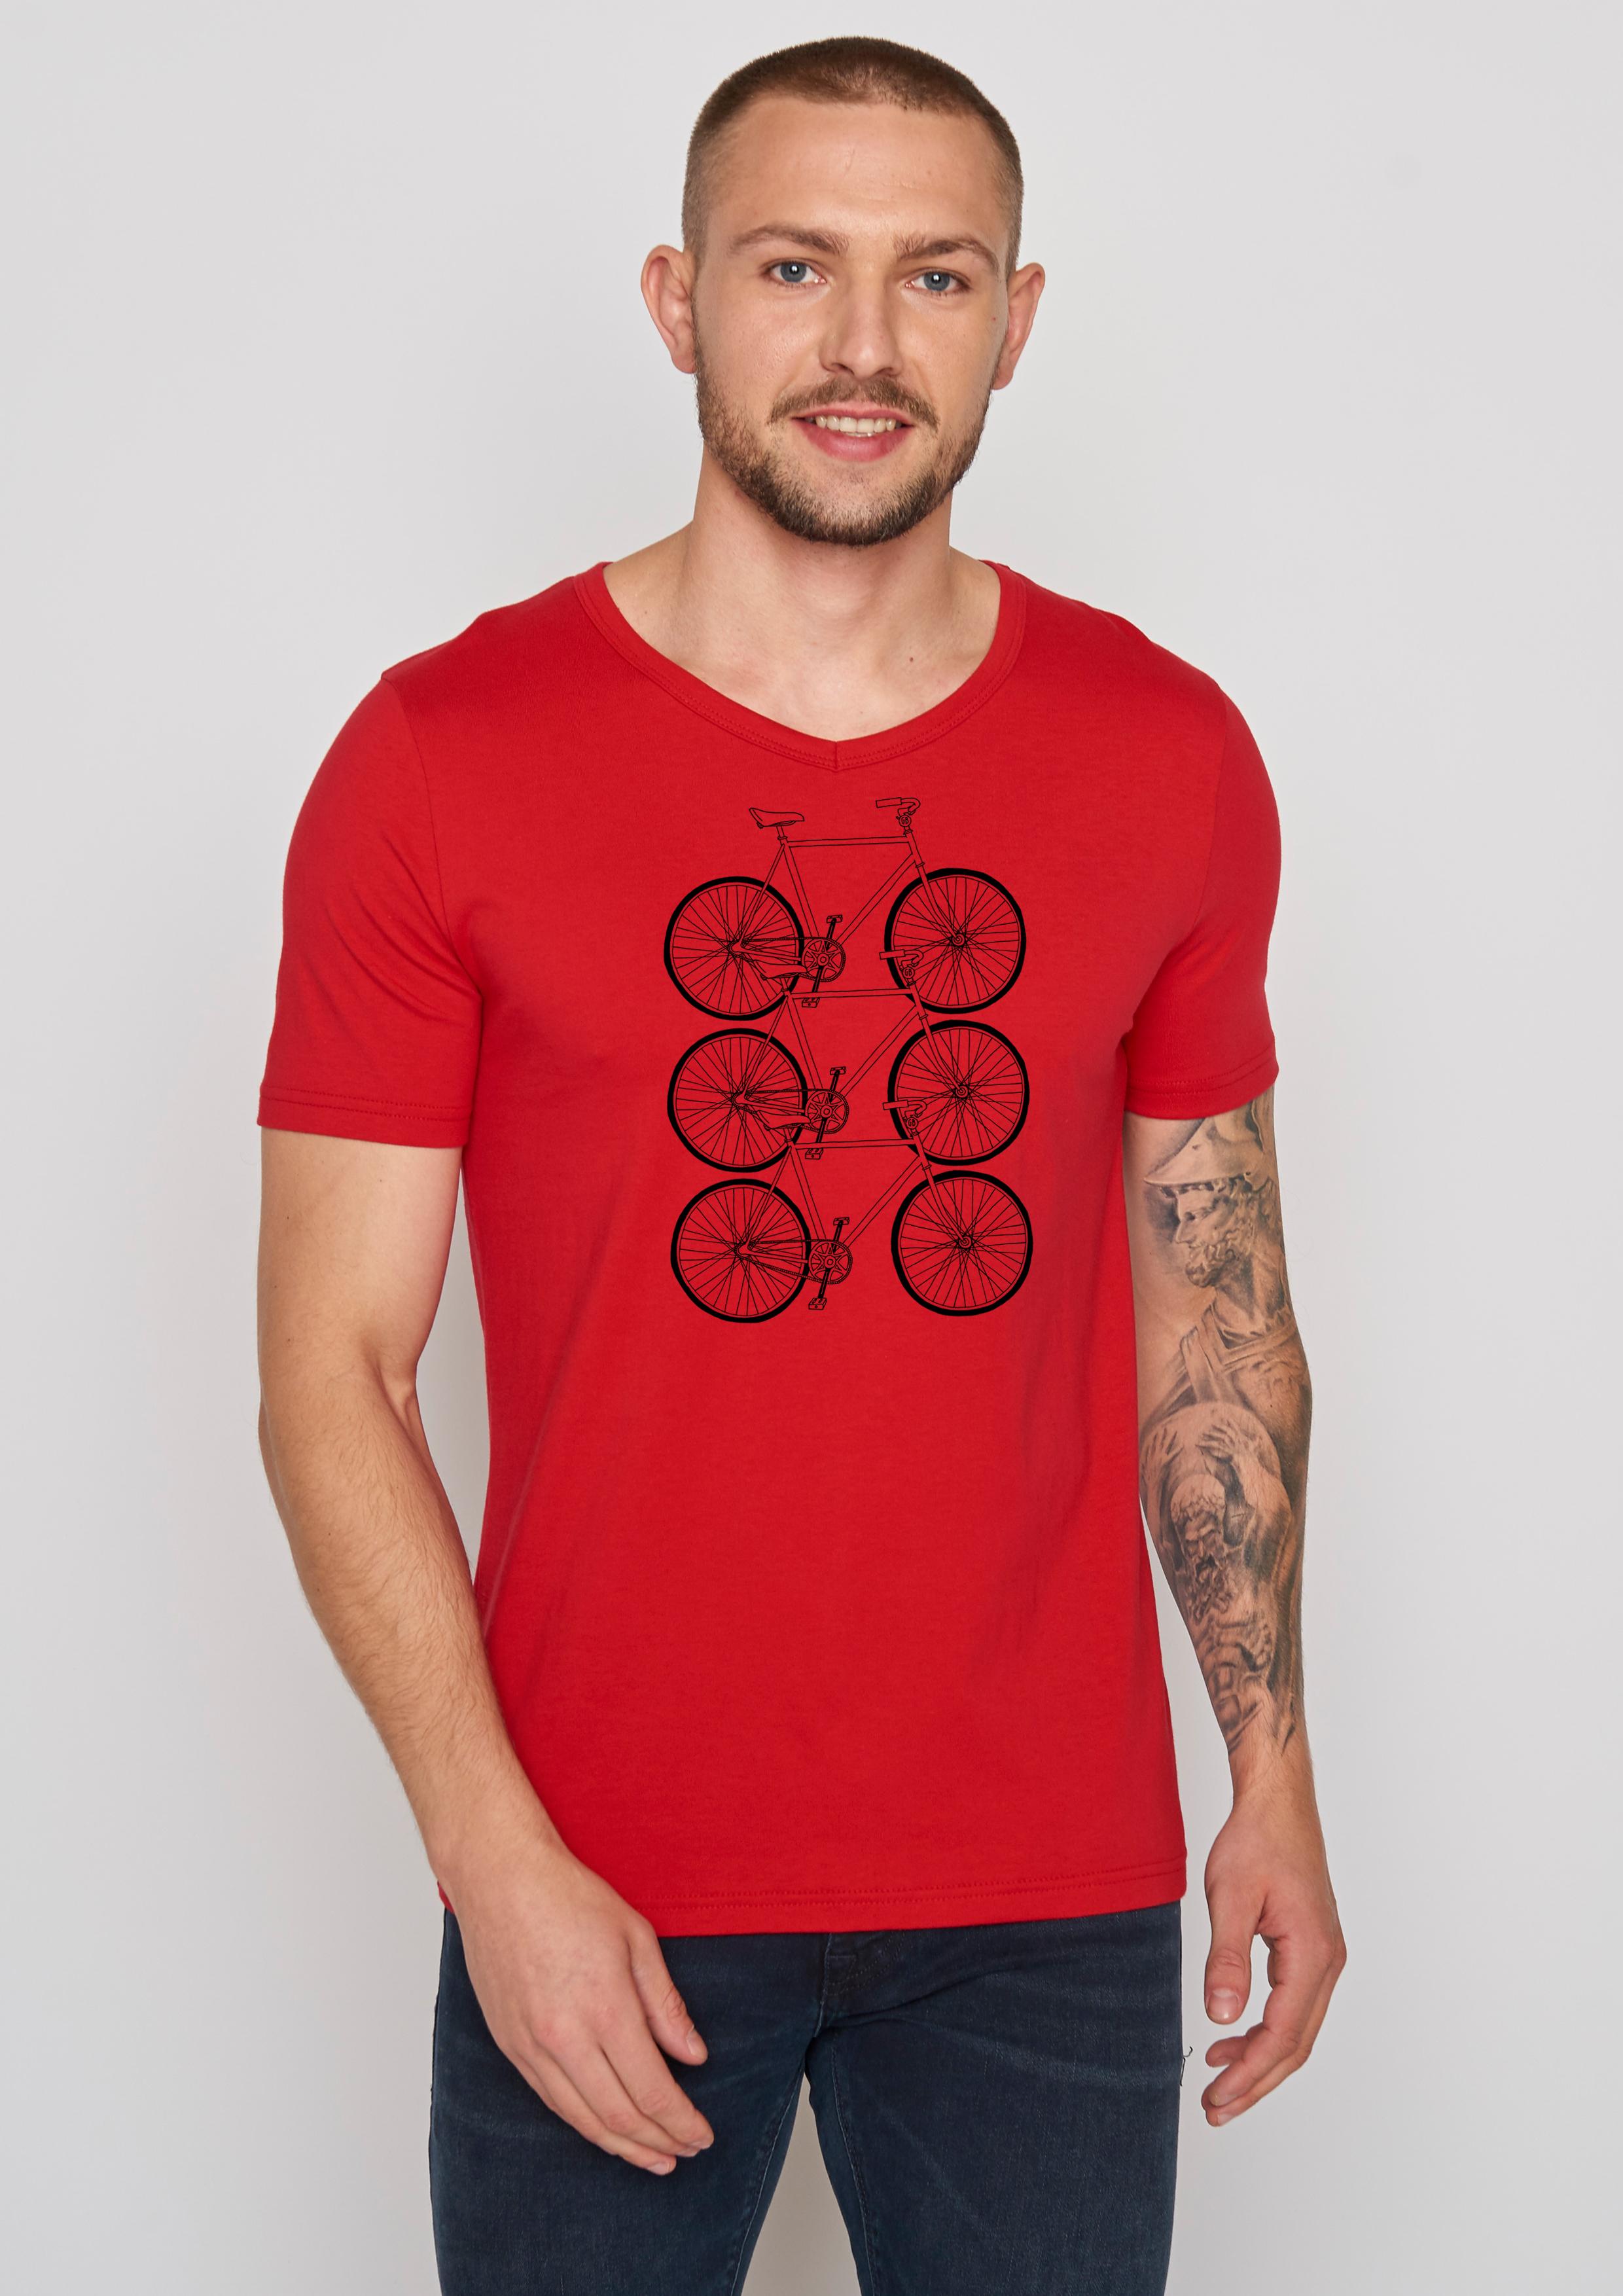 Bike_trio_peak_tango_red_front